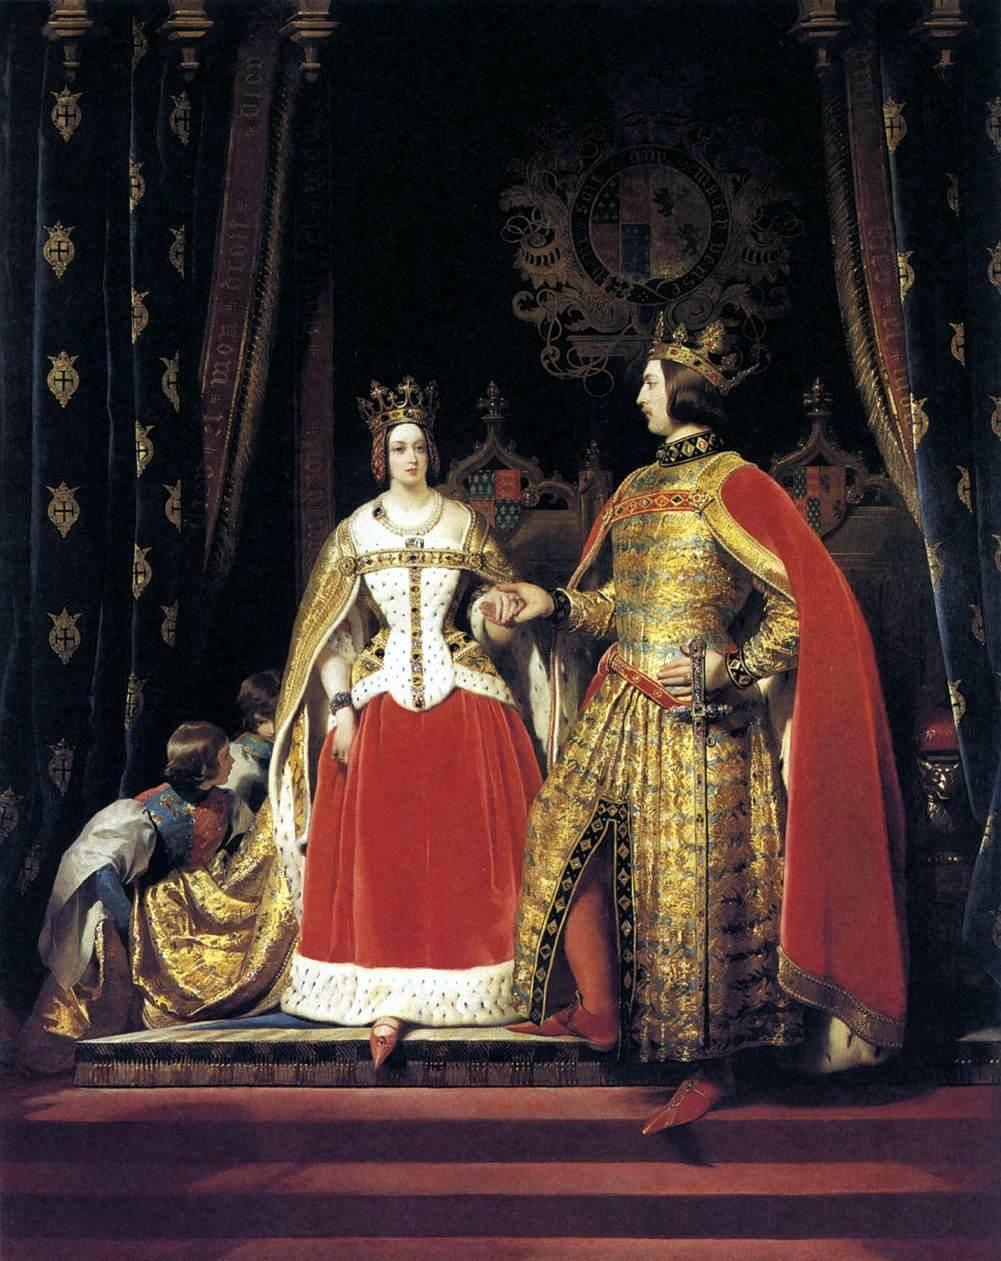 La regina Vittoria e il principe Alberto al Bal Costumé (Sir Edwin Landseer, 1842)